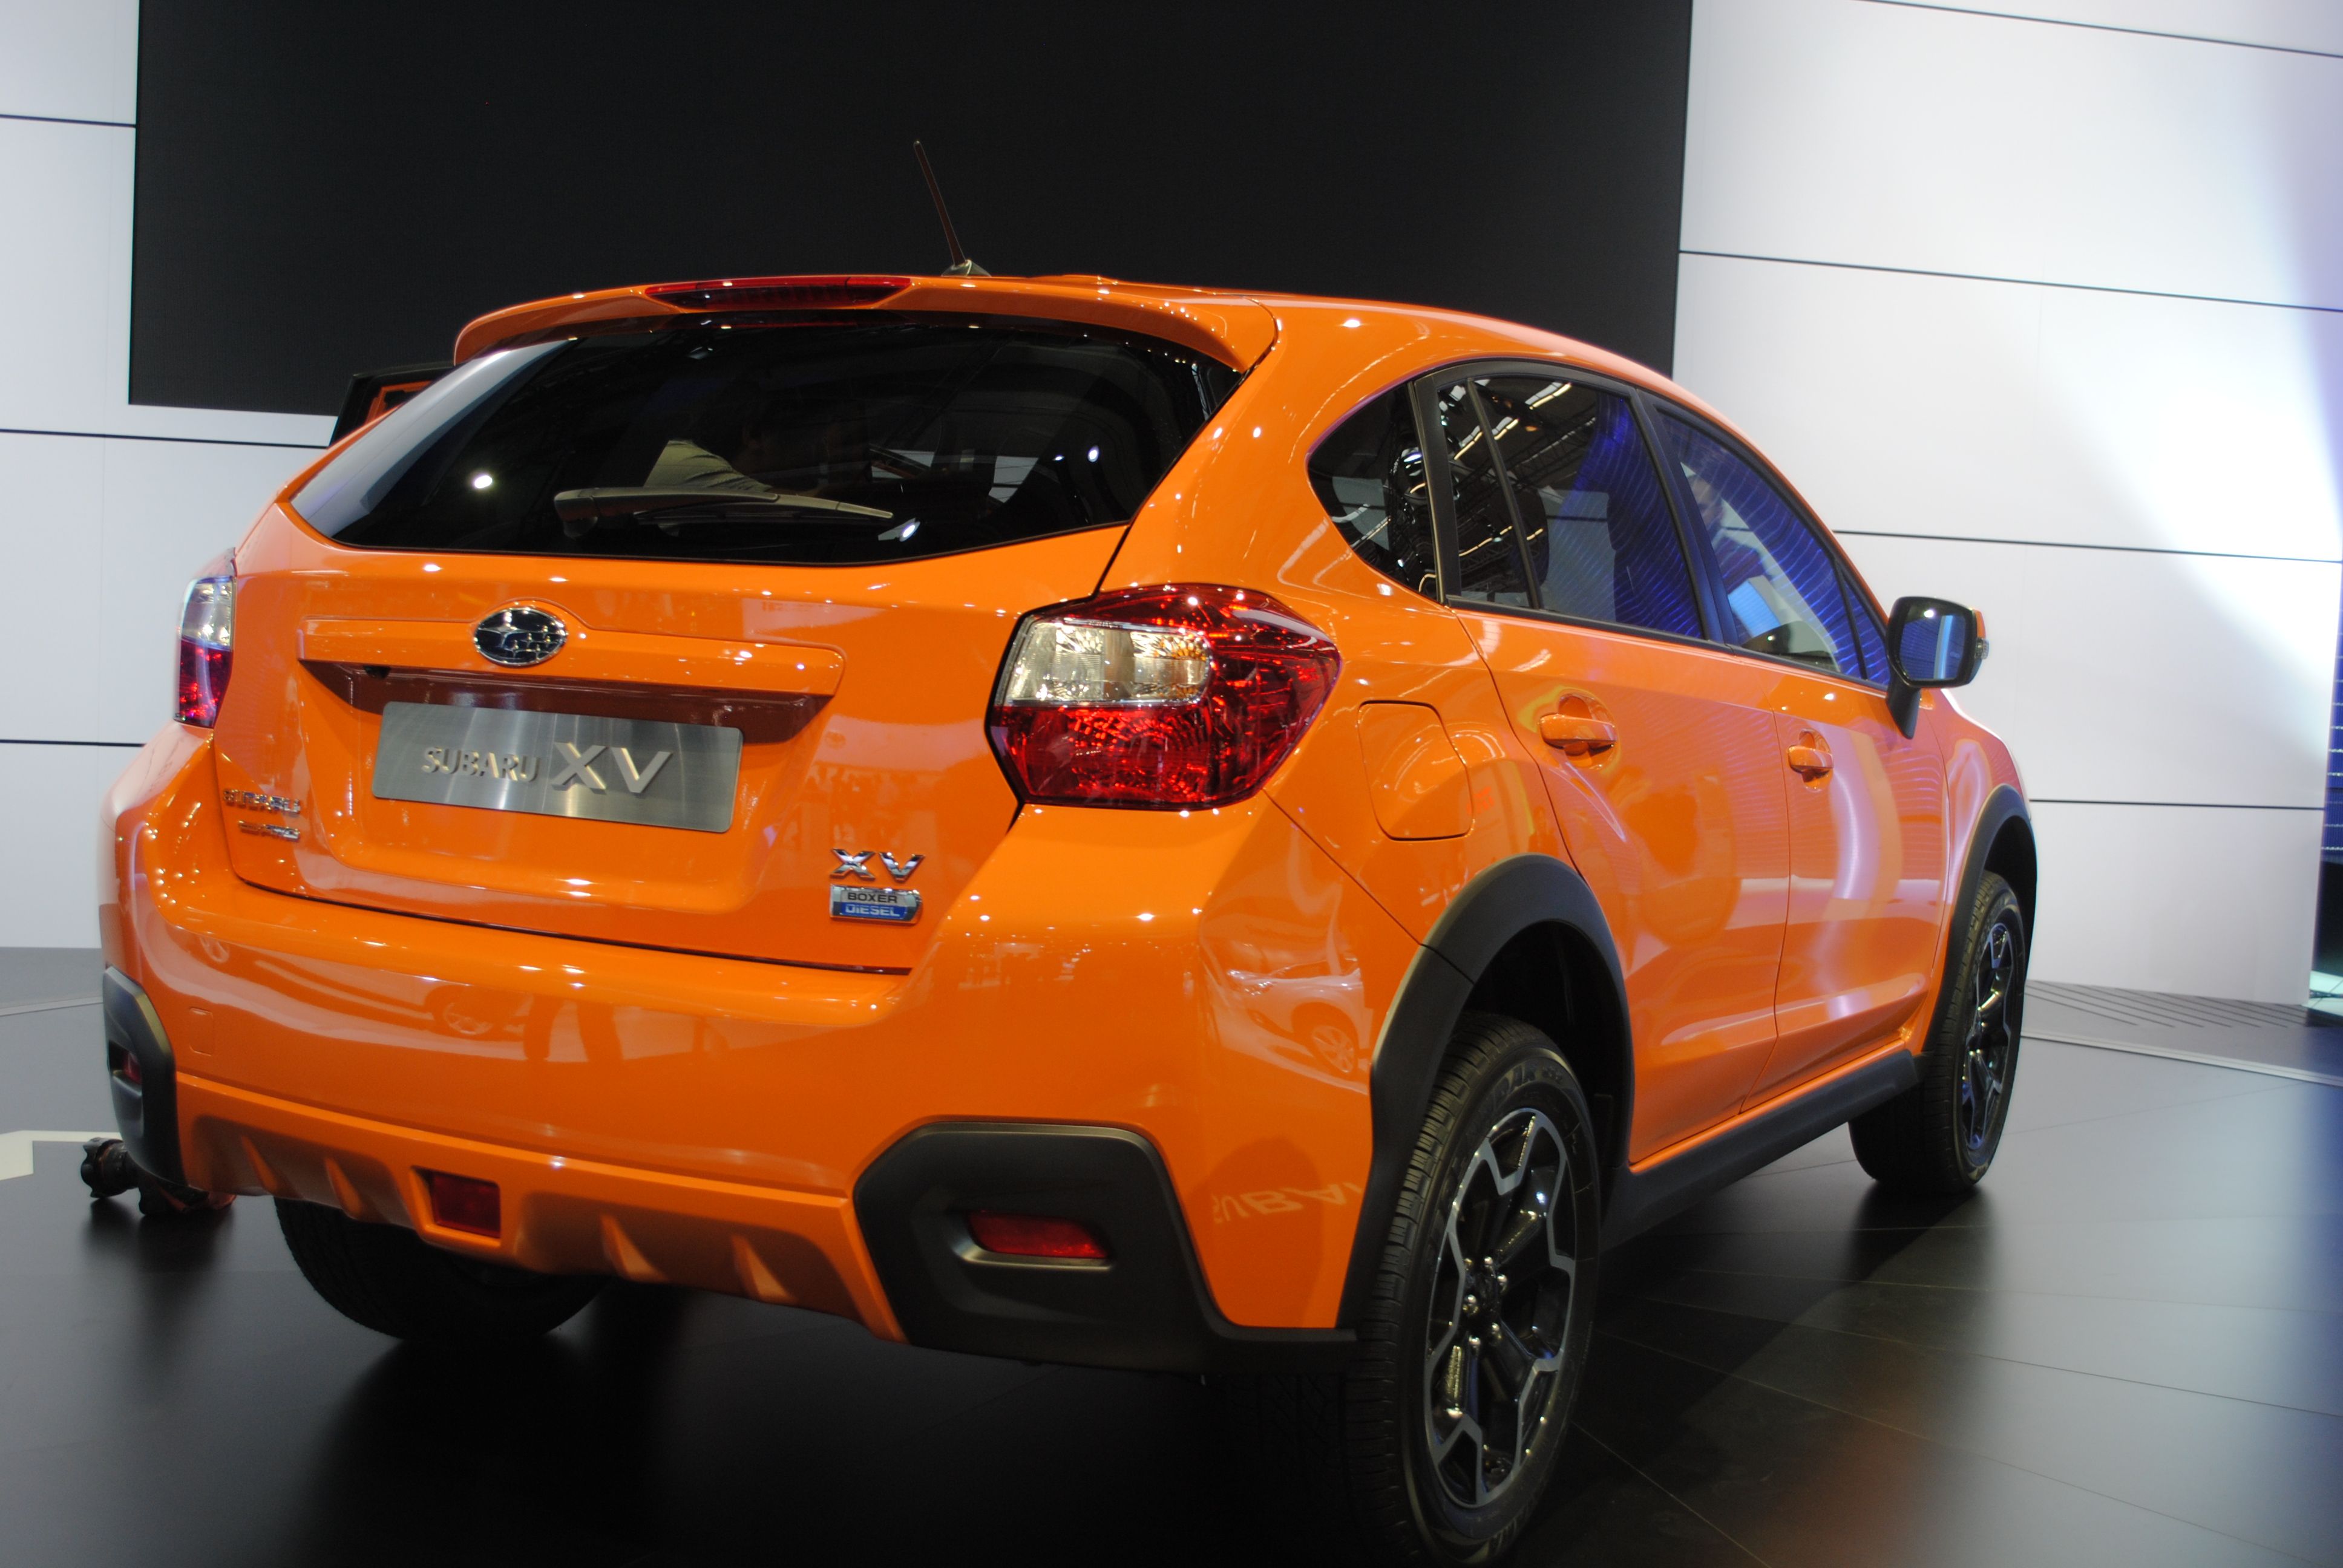 Subaru Crosstrek Wiki >> File:Subaru XV at the Frankfurt Motor Show IAA 2011 (6143988283).jpg - Wikimedia Commons